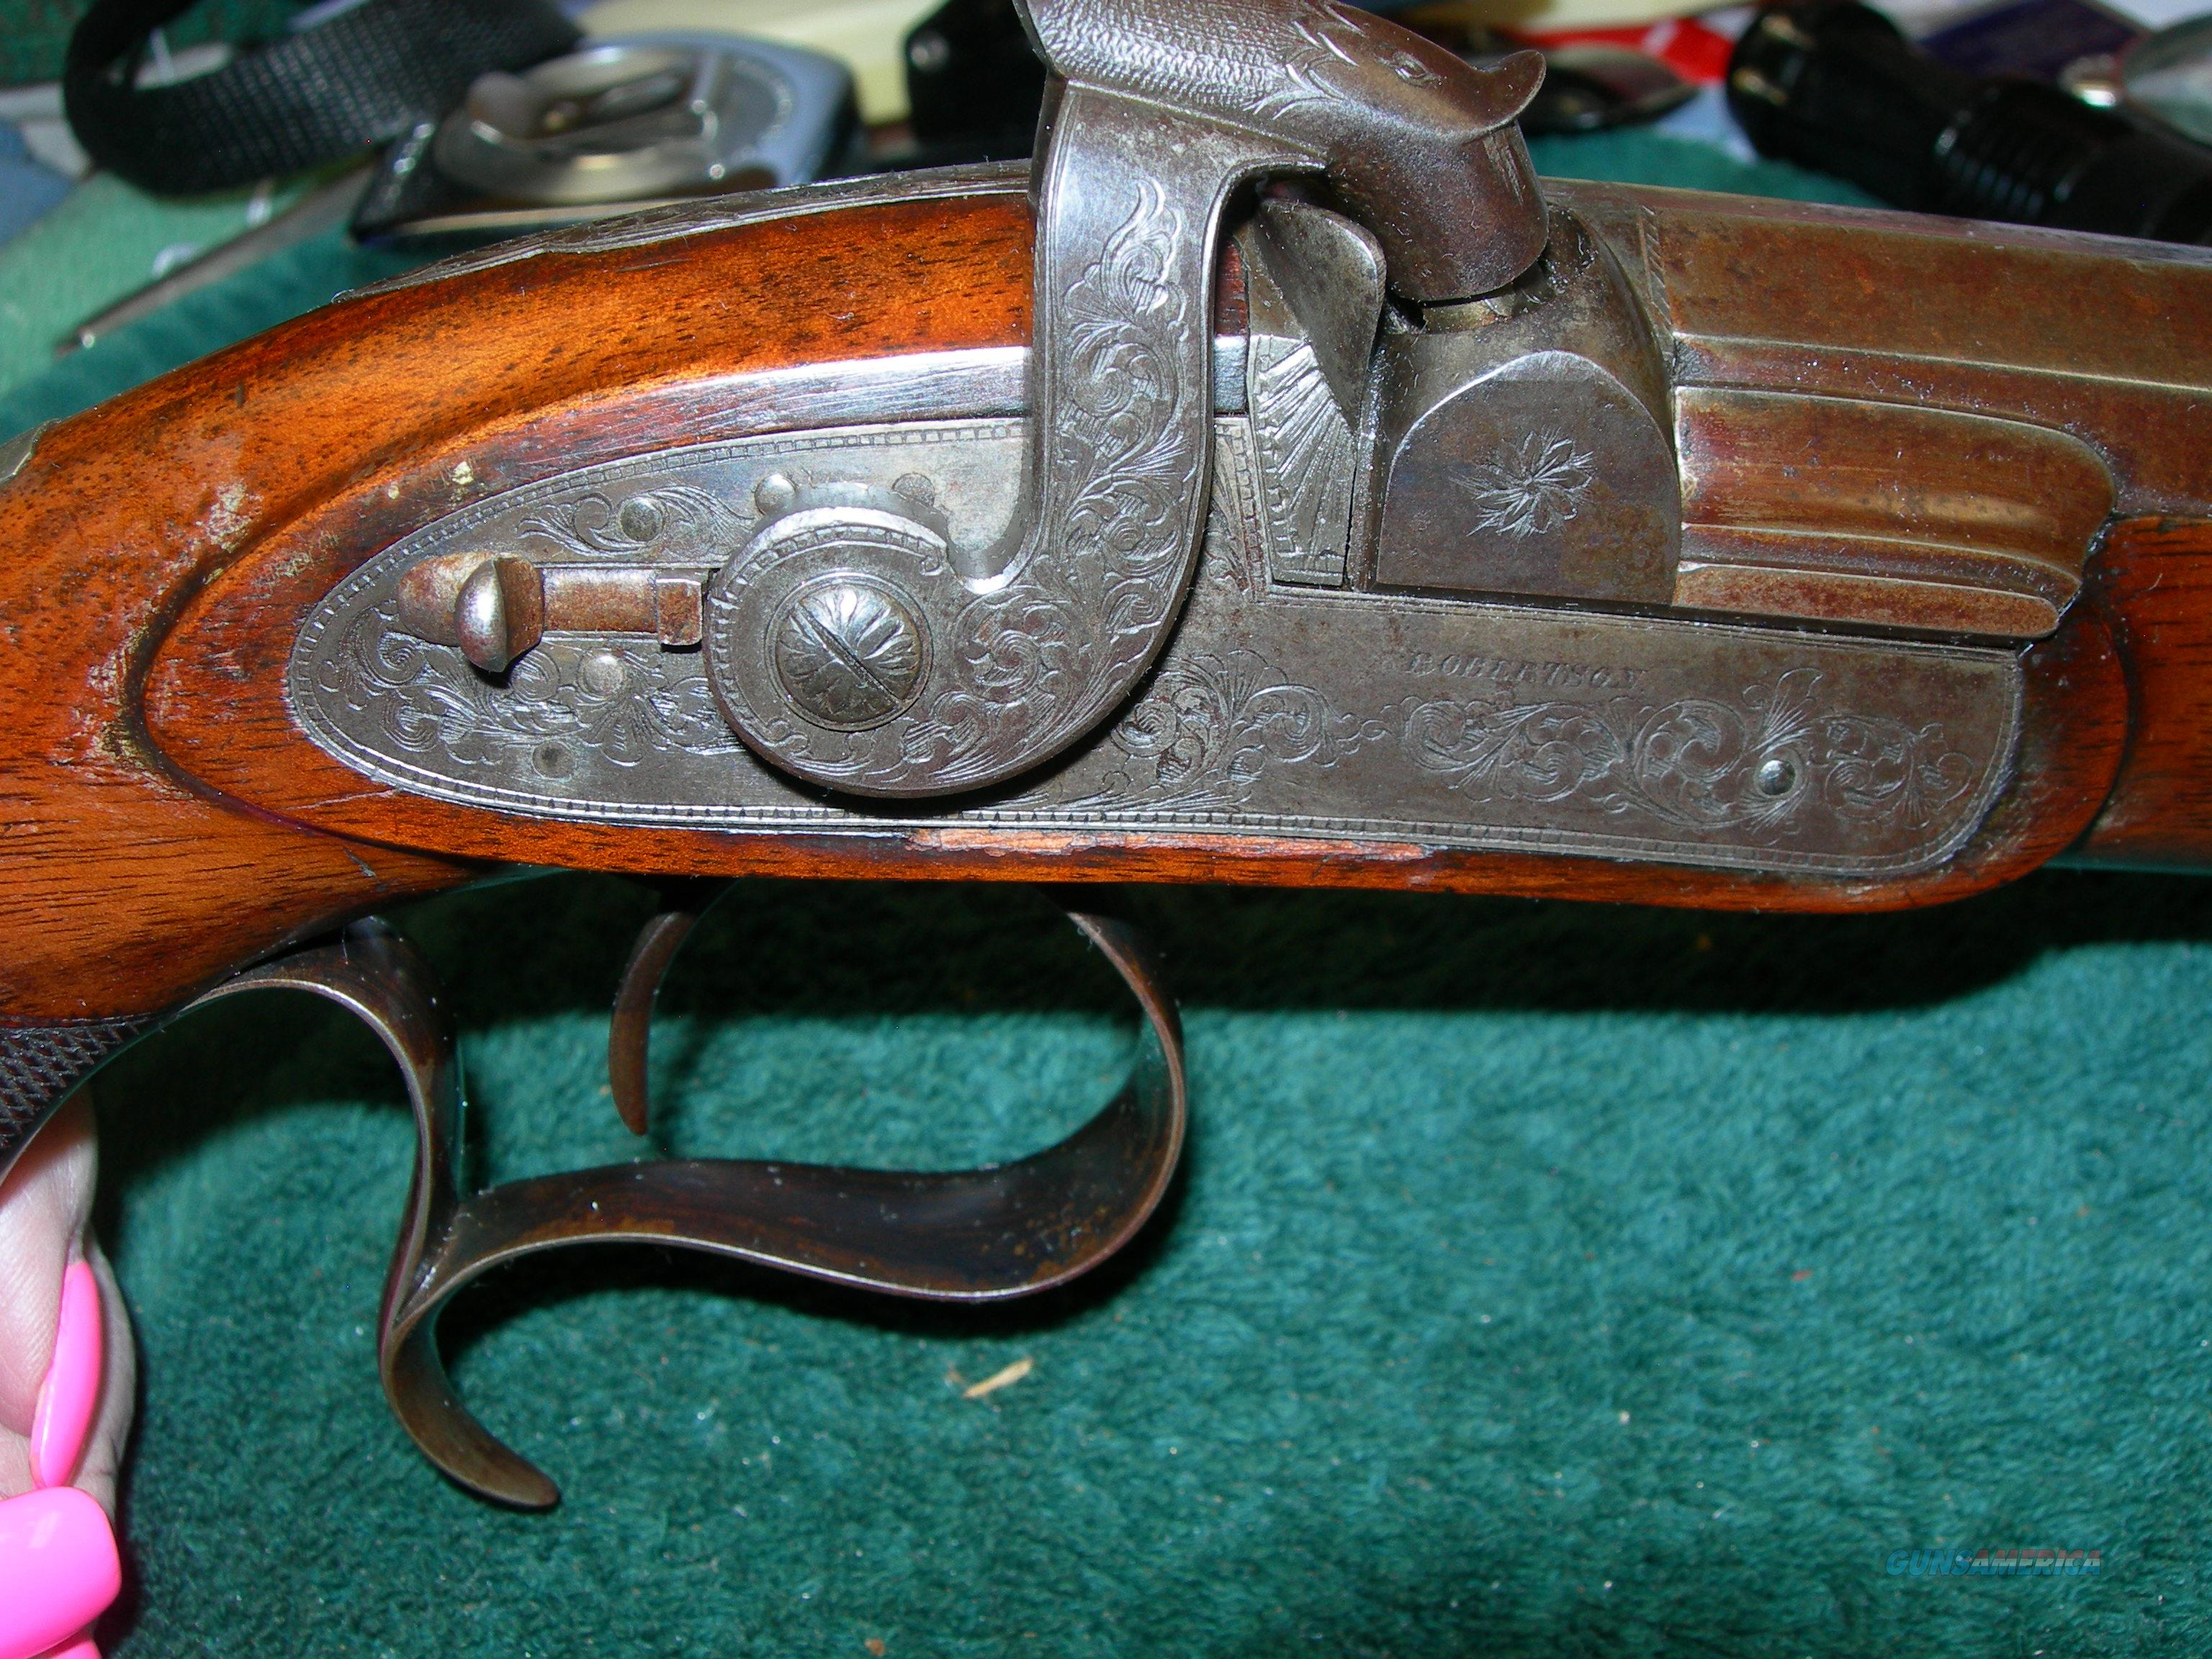 J&M#4: Philadelphia Dueling Pistol Percussion Famous Owner 44cal Great Bore, Fantastic Original Condition,  Guns > Pistols > Antique (Pre-1899) Pistols - Perc. Misc.